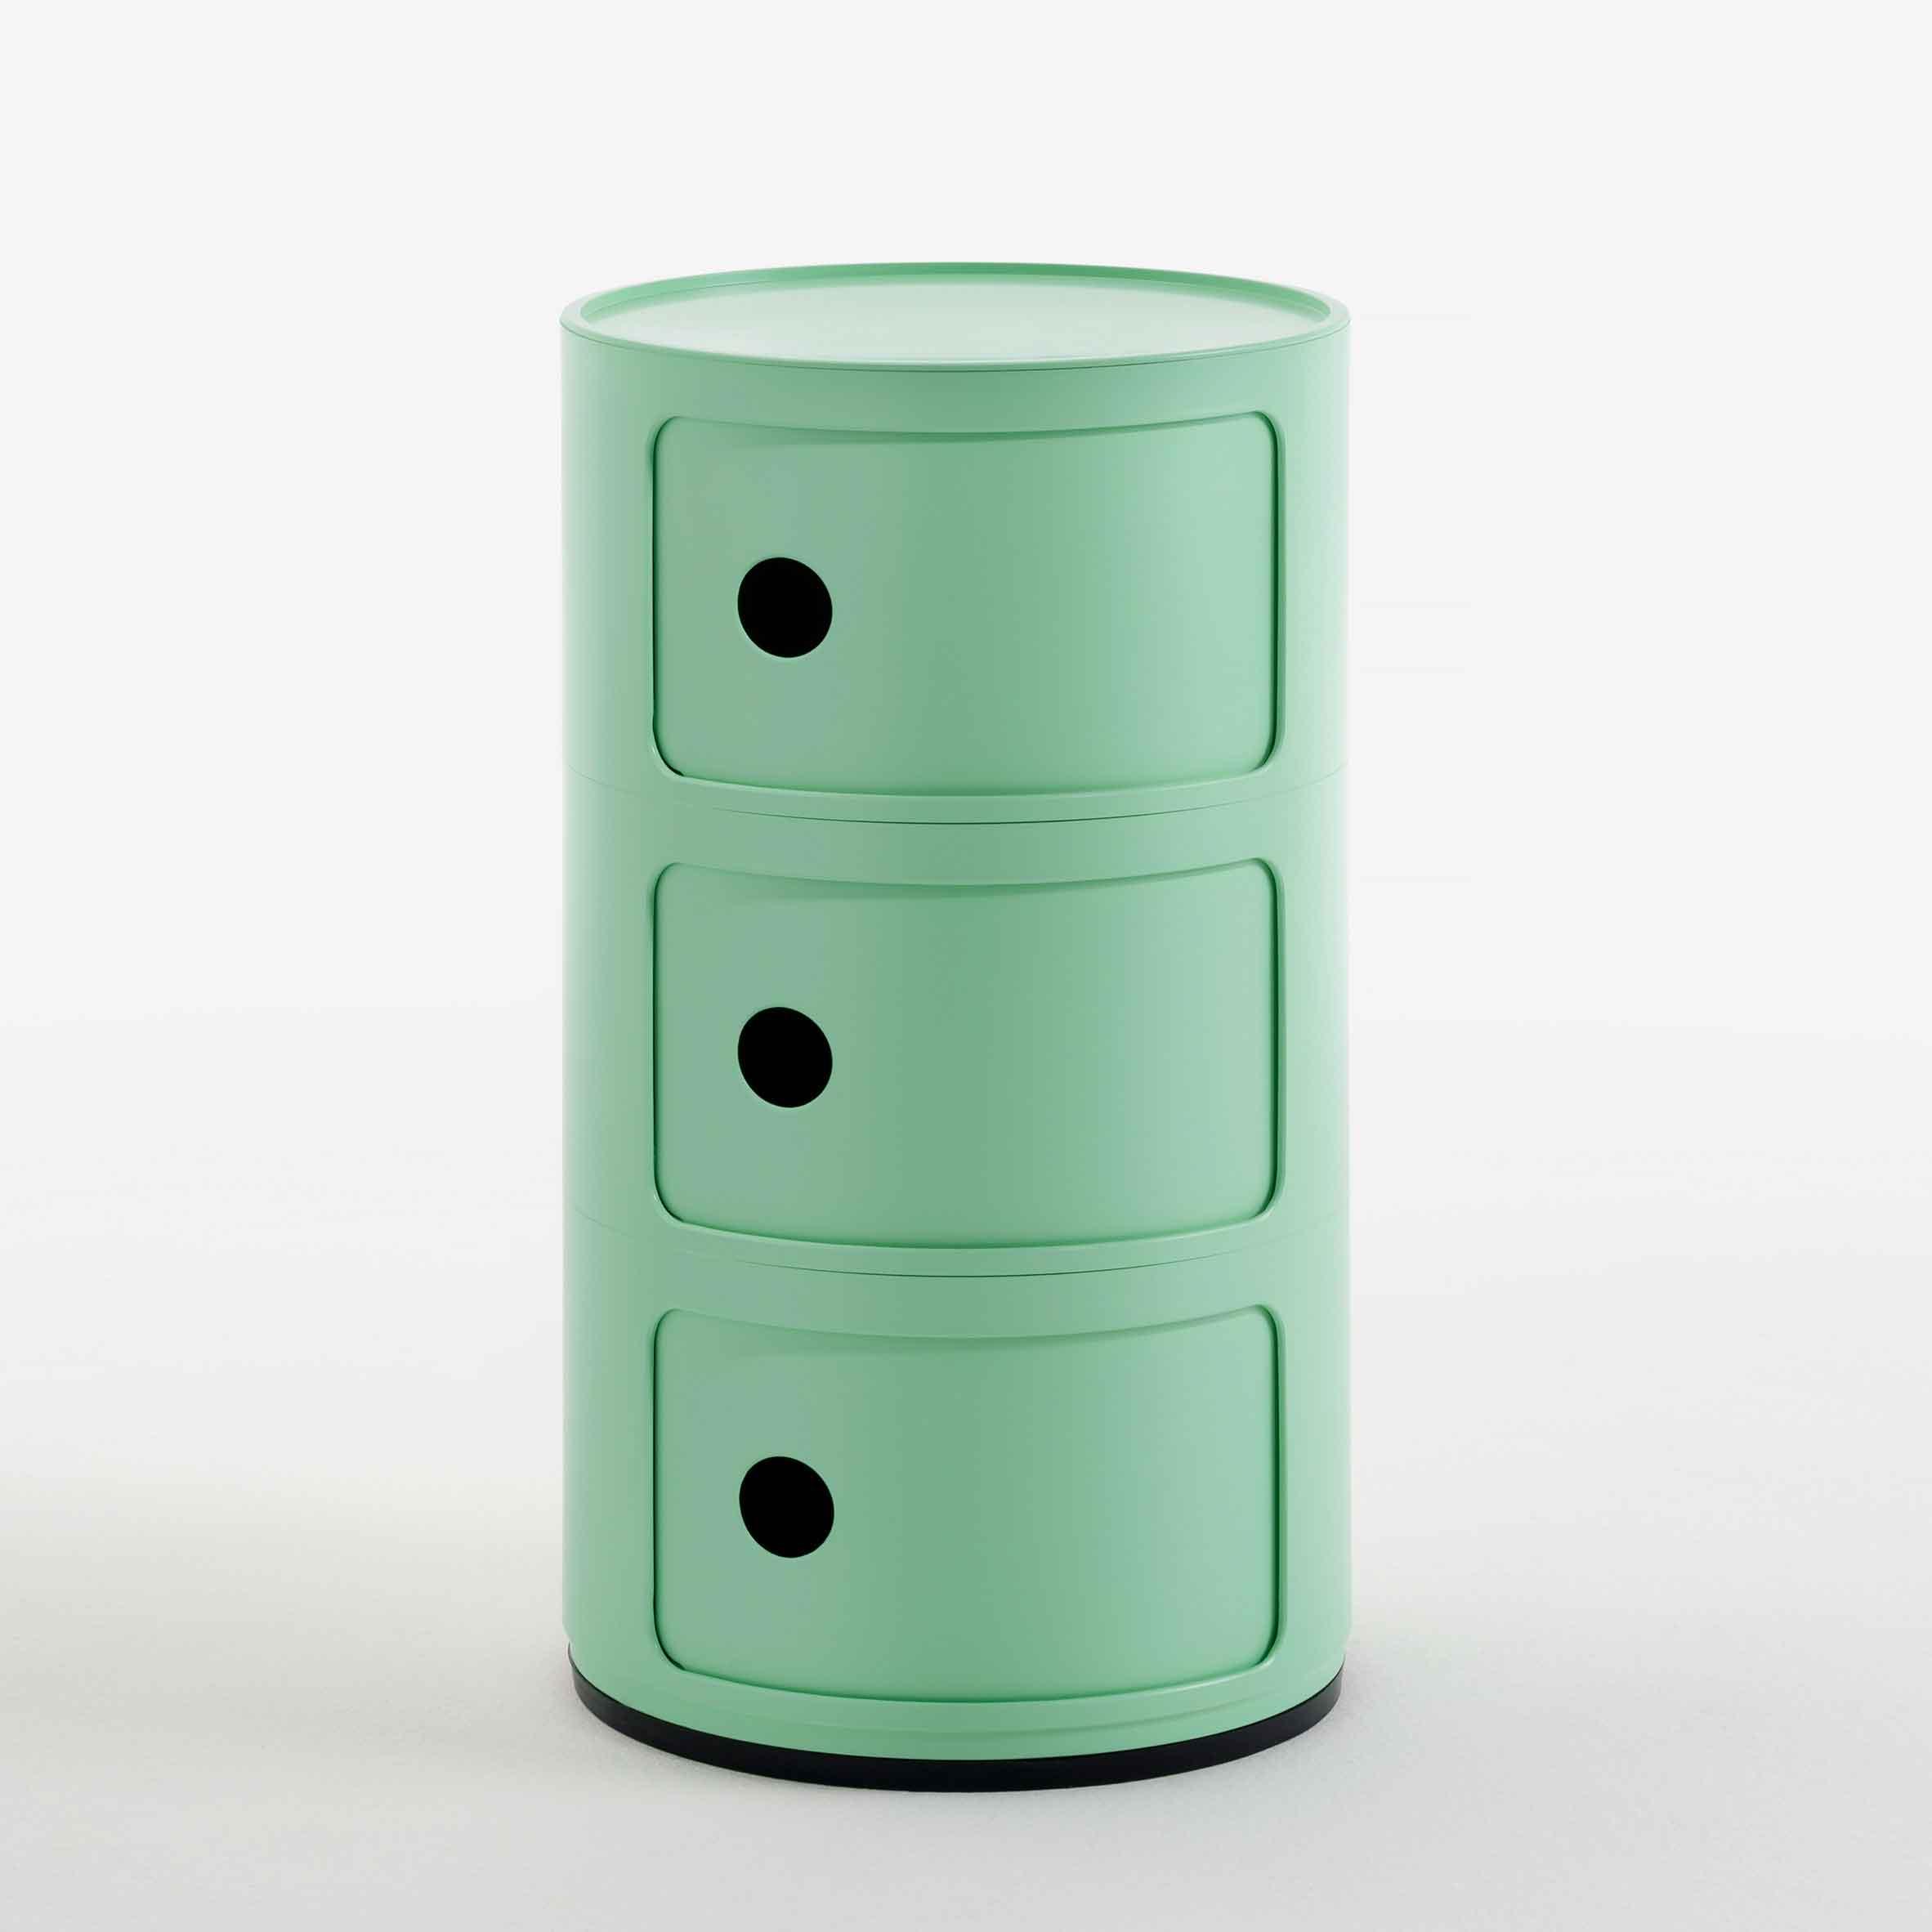 componibili из биопластика зеленого цвета